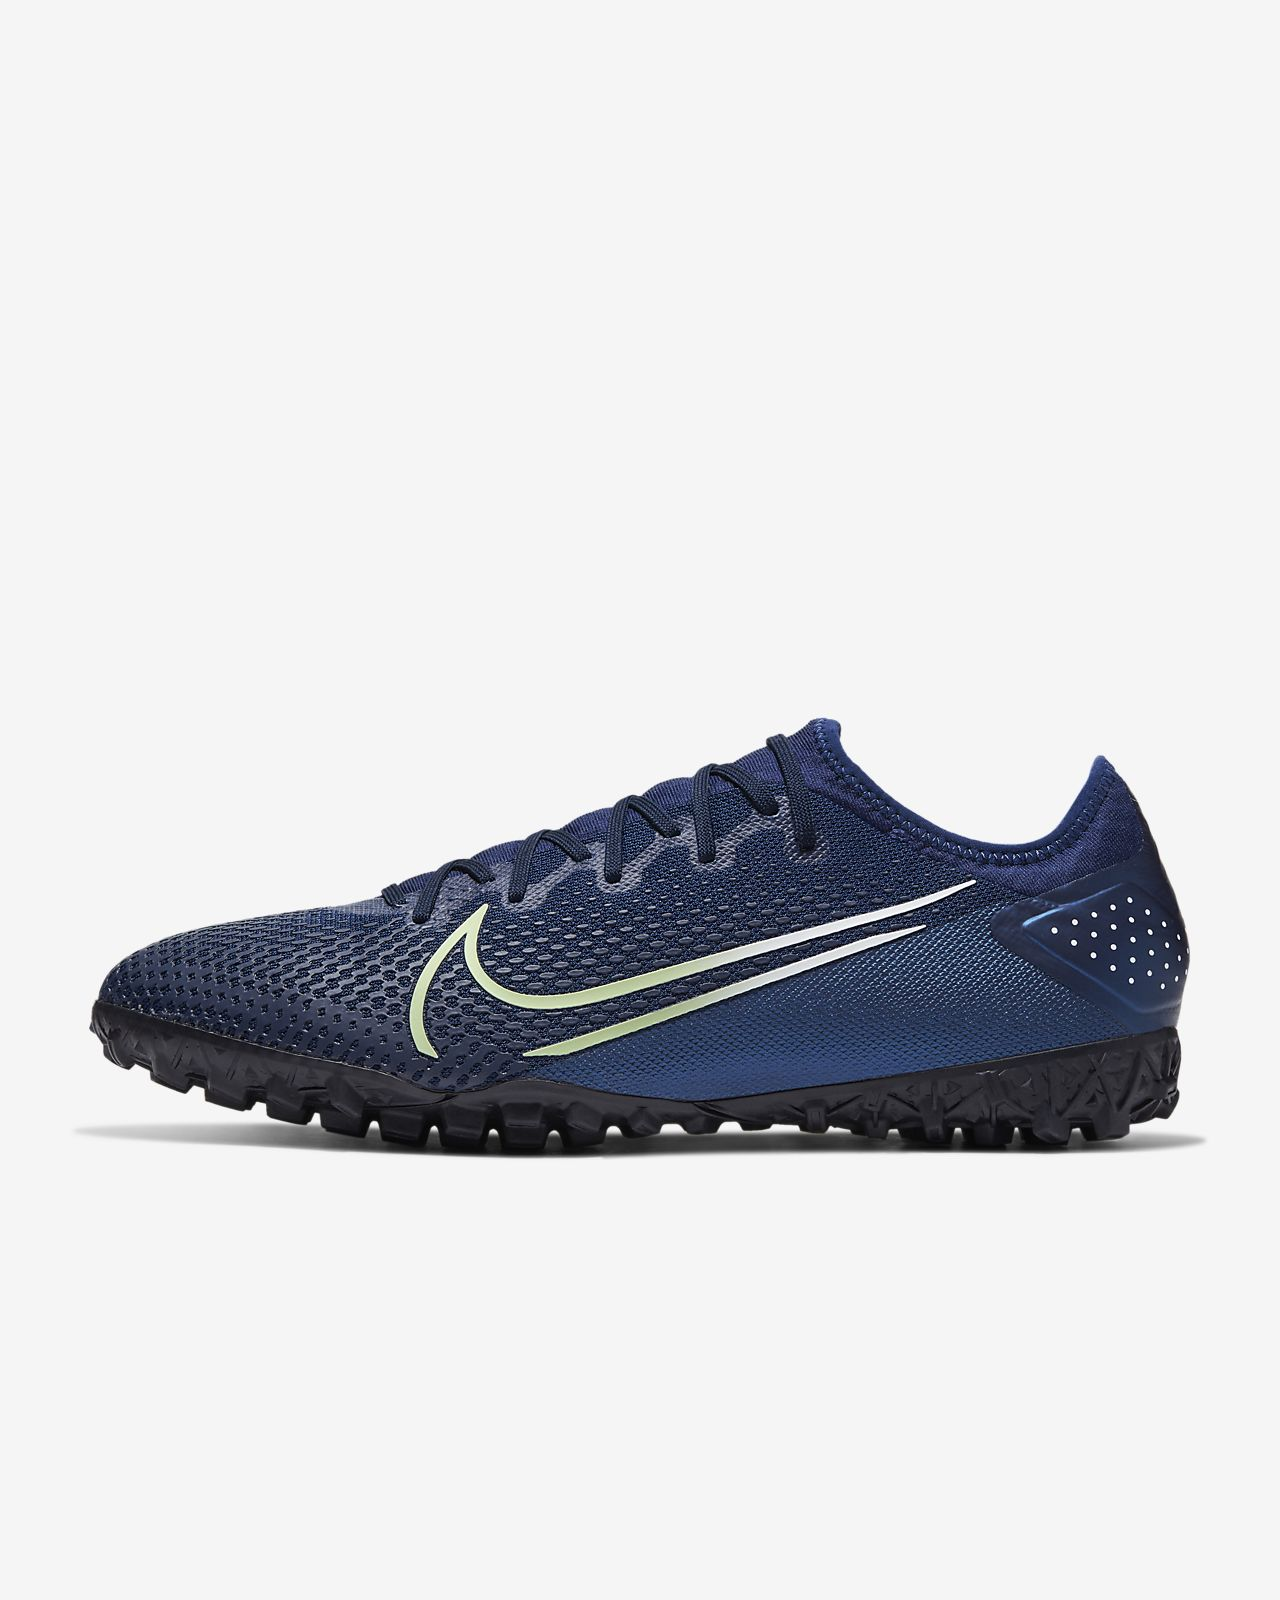 Nike Vapor 13 Pro MDS TF 男/女人造场地足球鞋